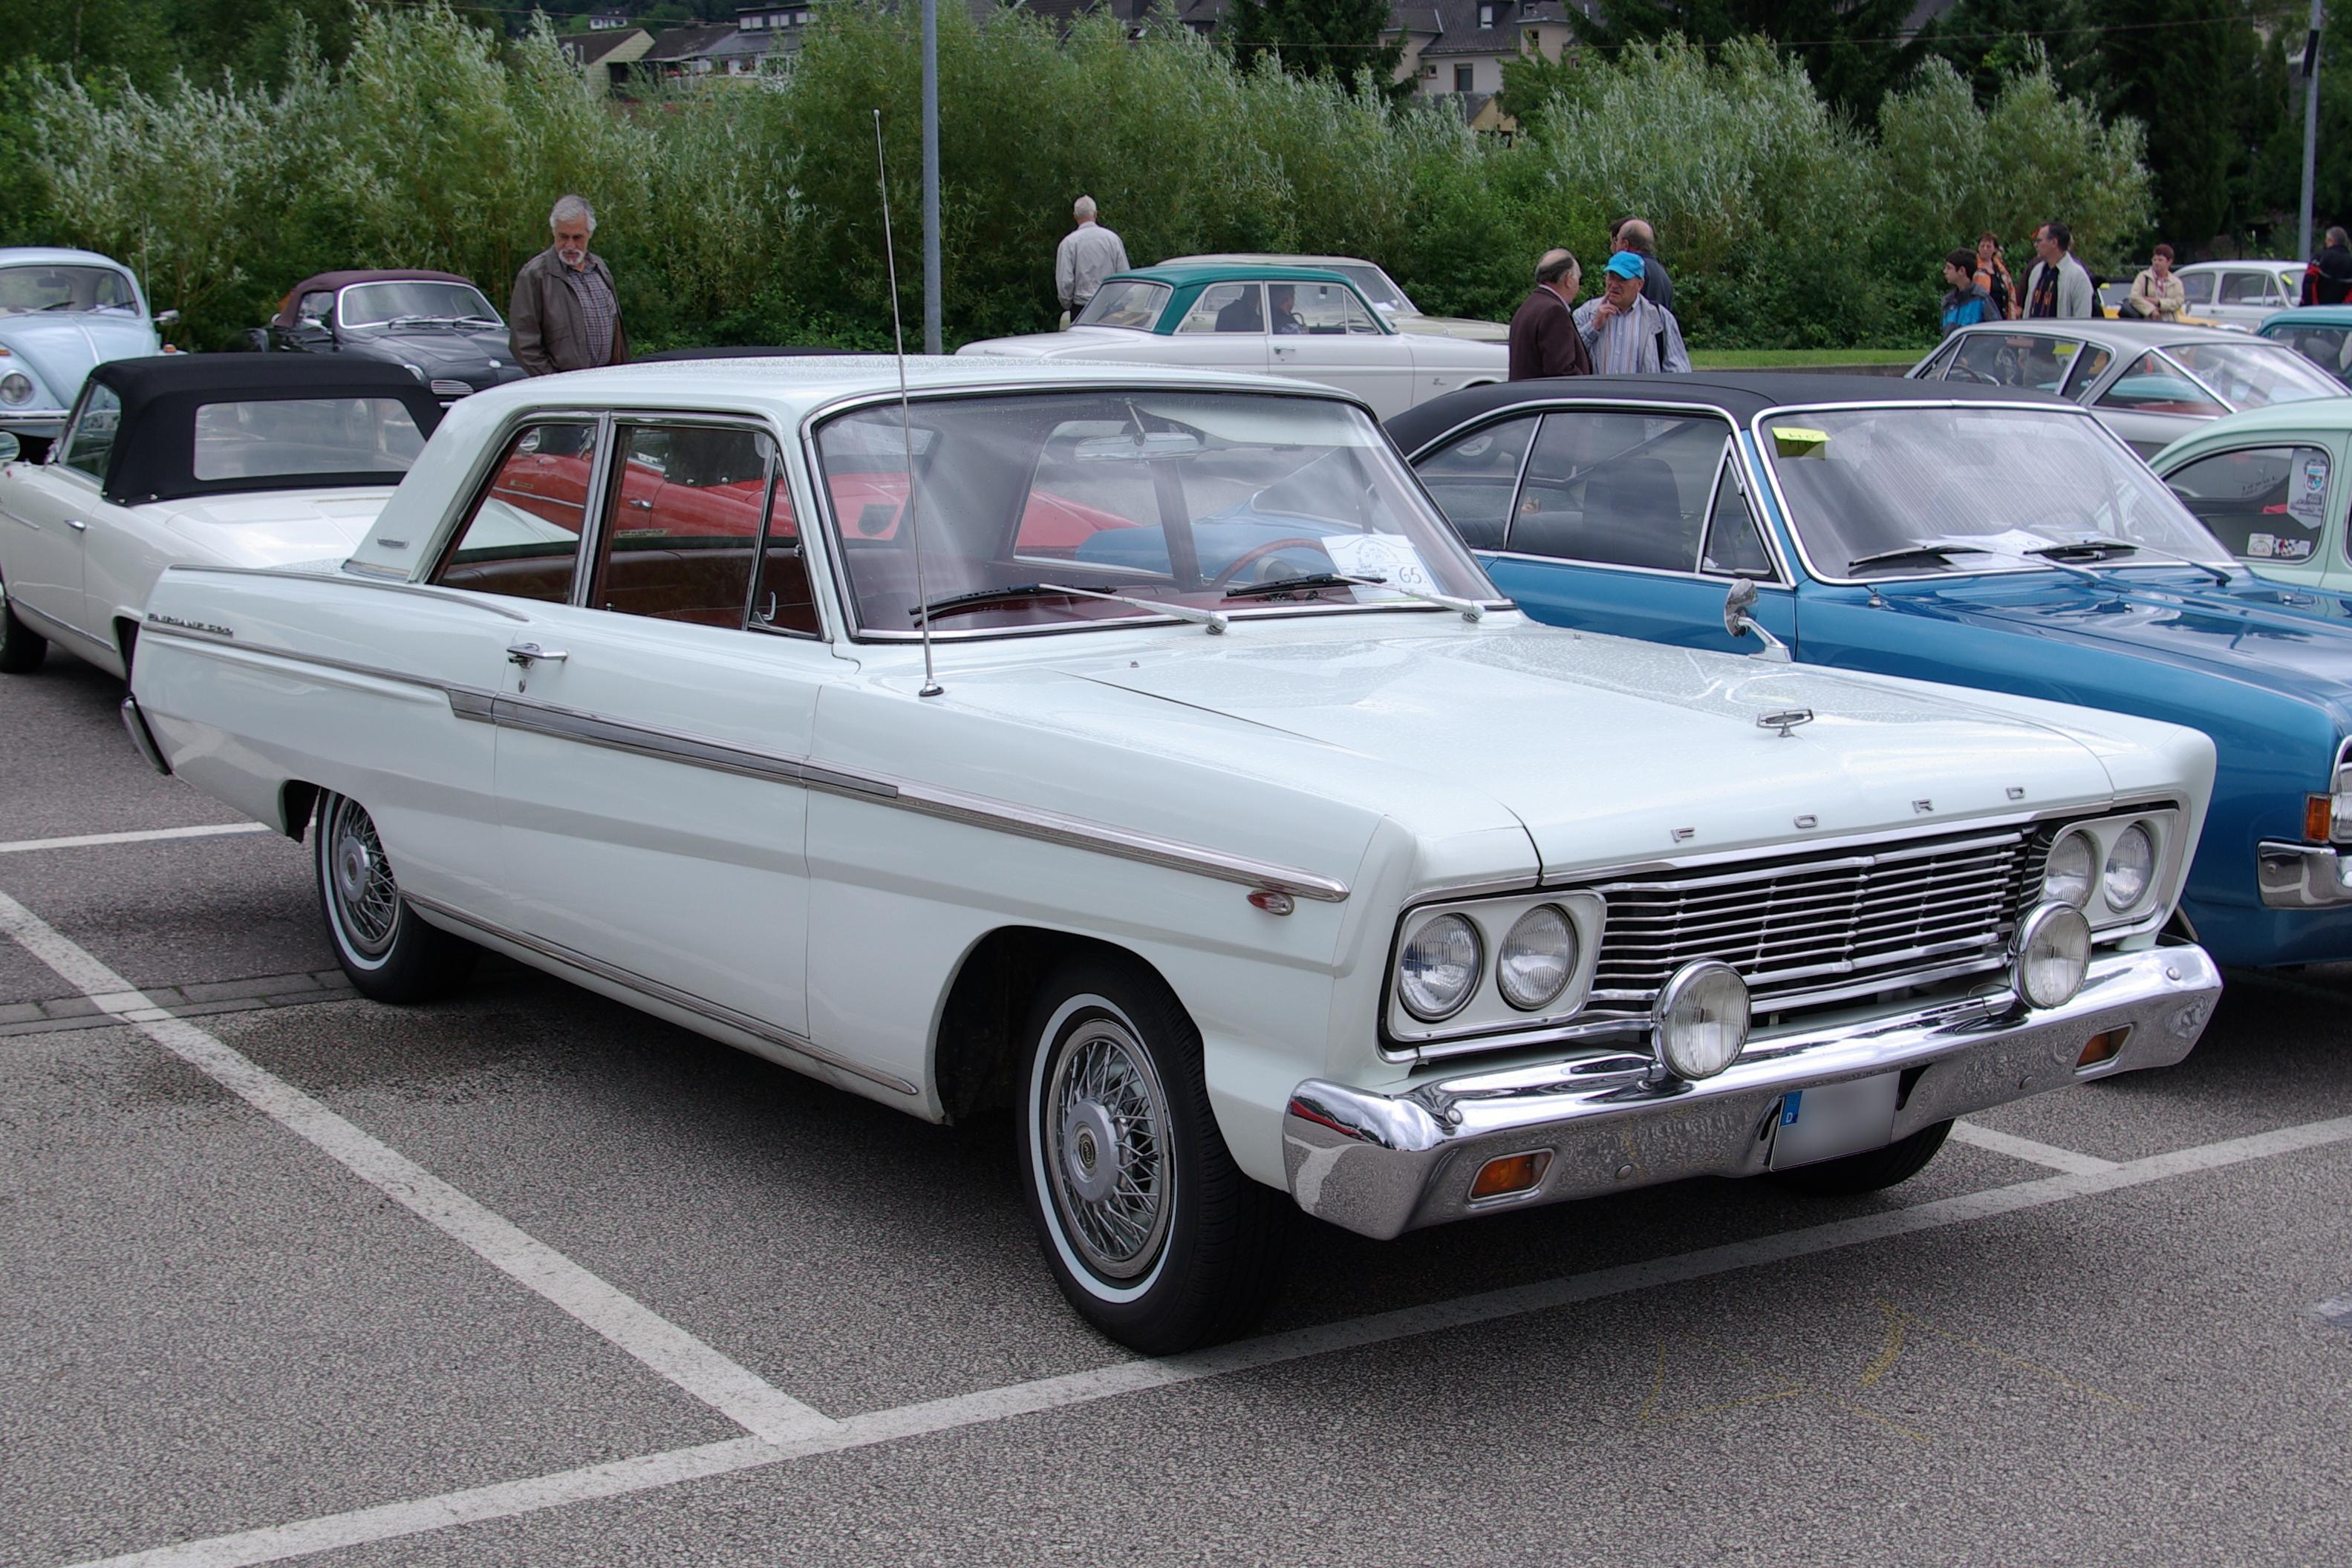 File:Ford Fairlane BW 1.JPG - Wikimedia Commons